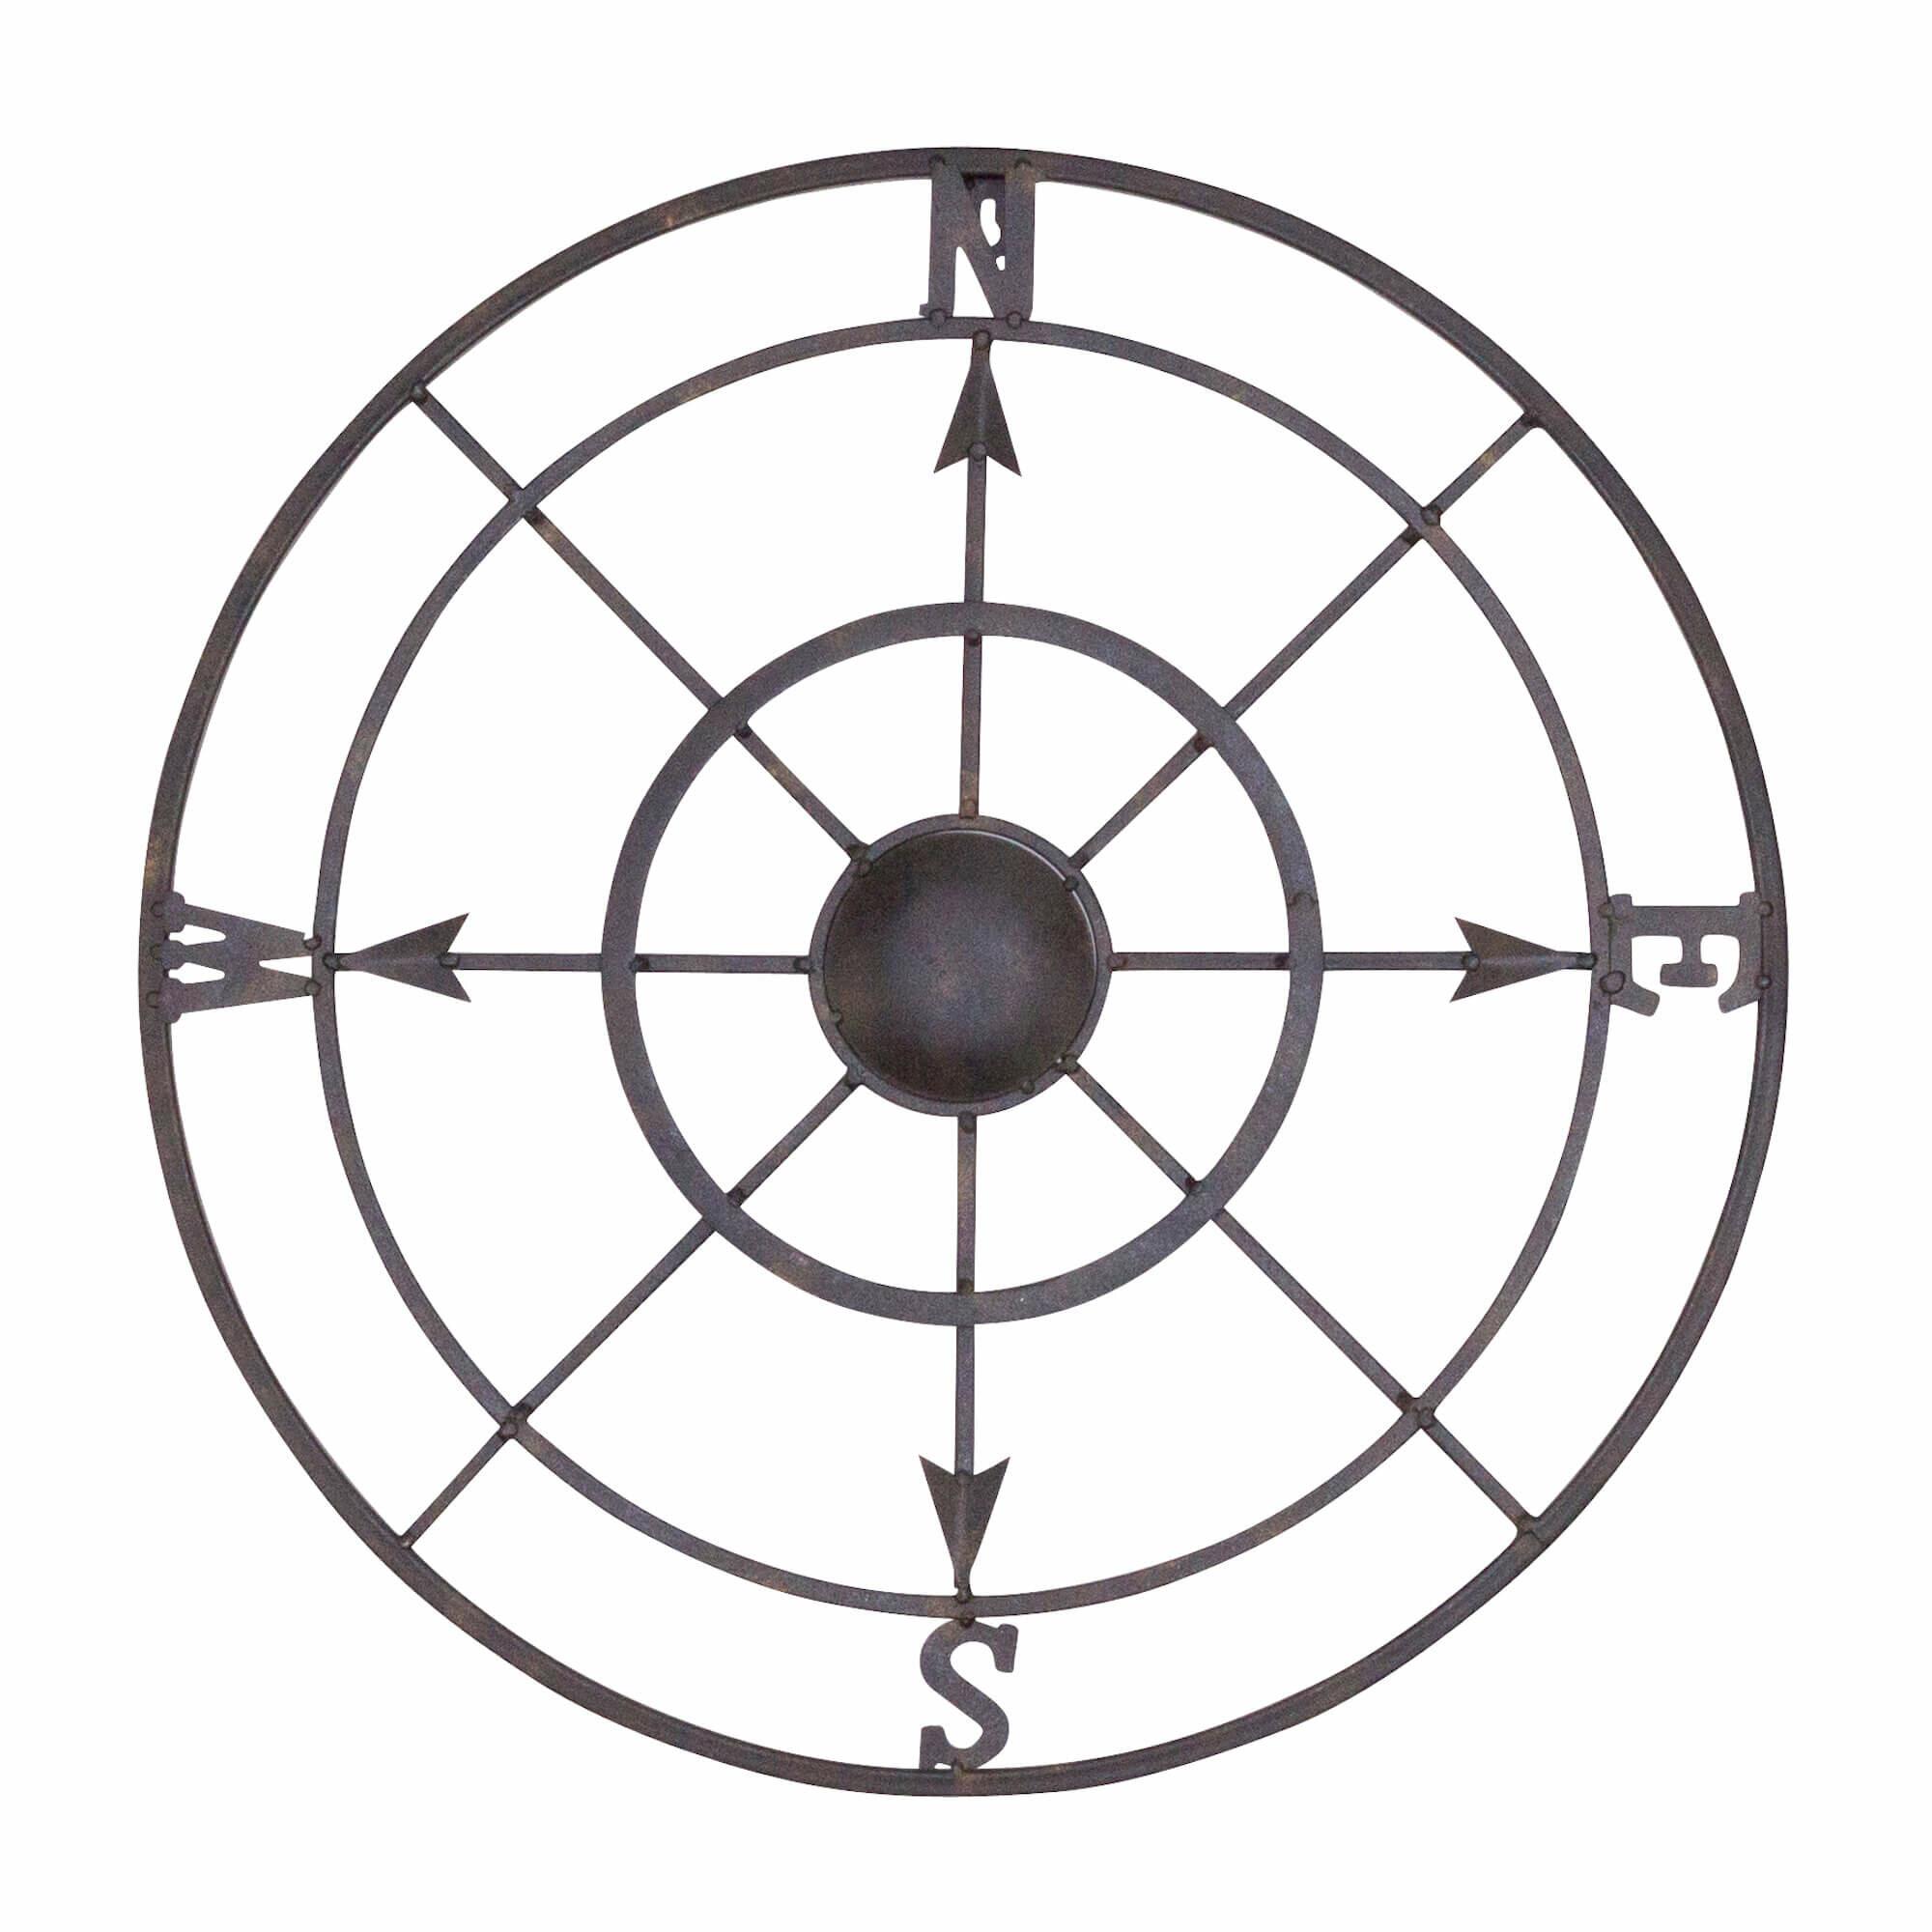 nautical metal compass rose wall décor reviews joss main